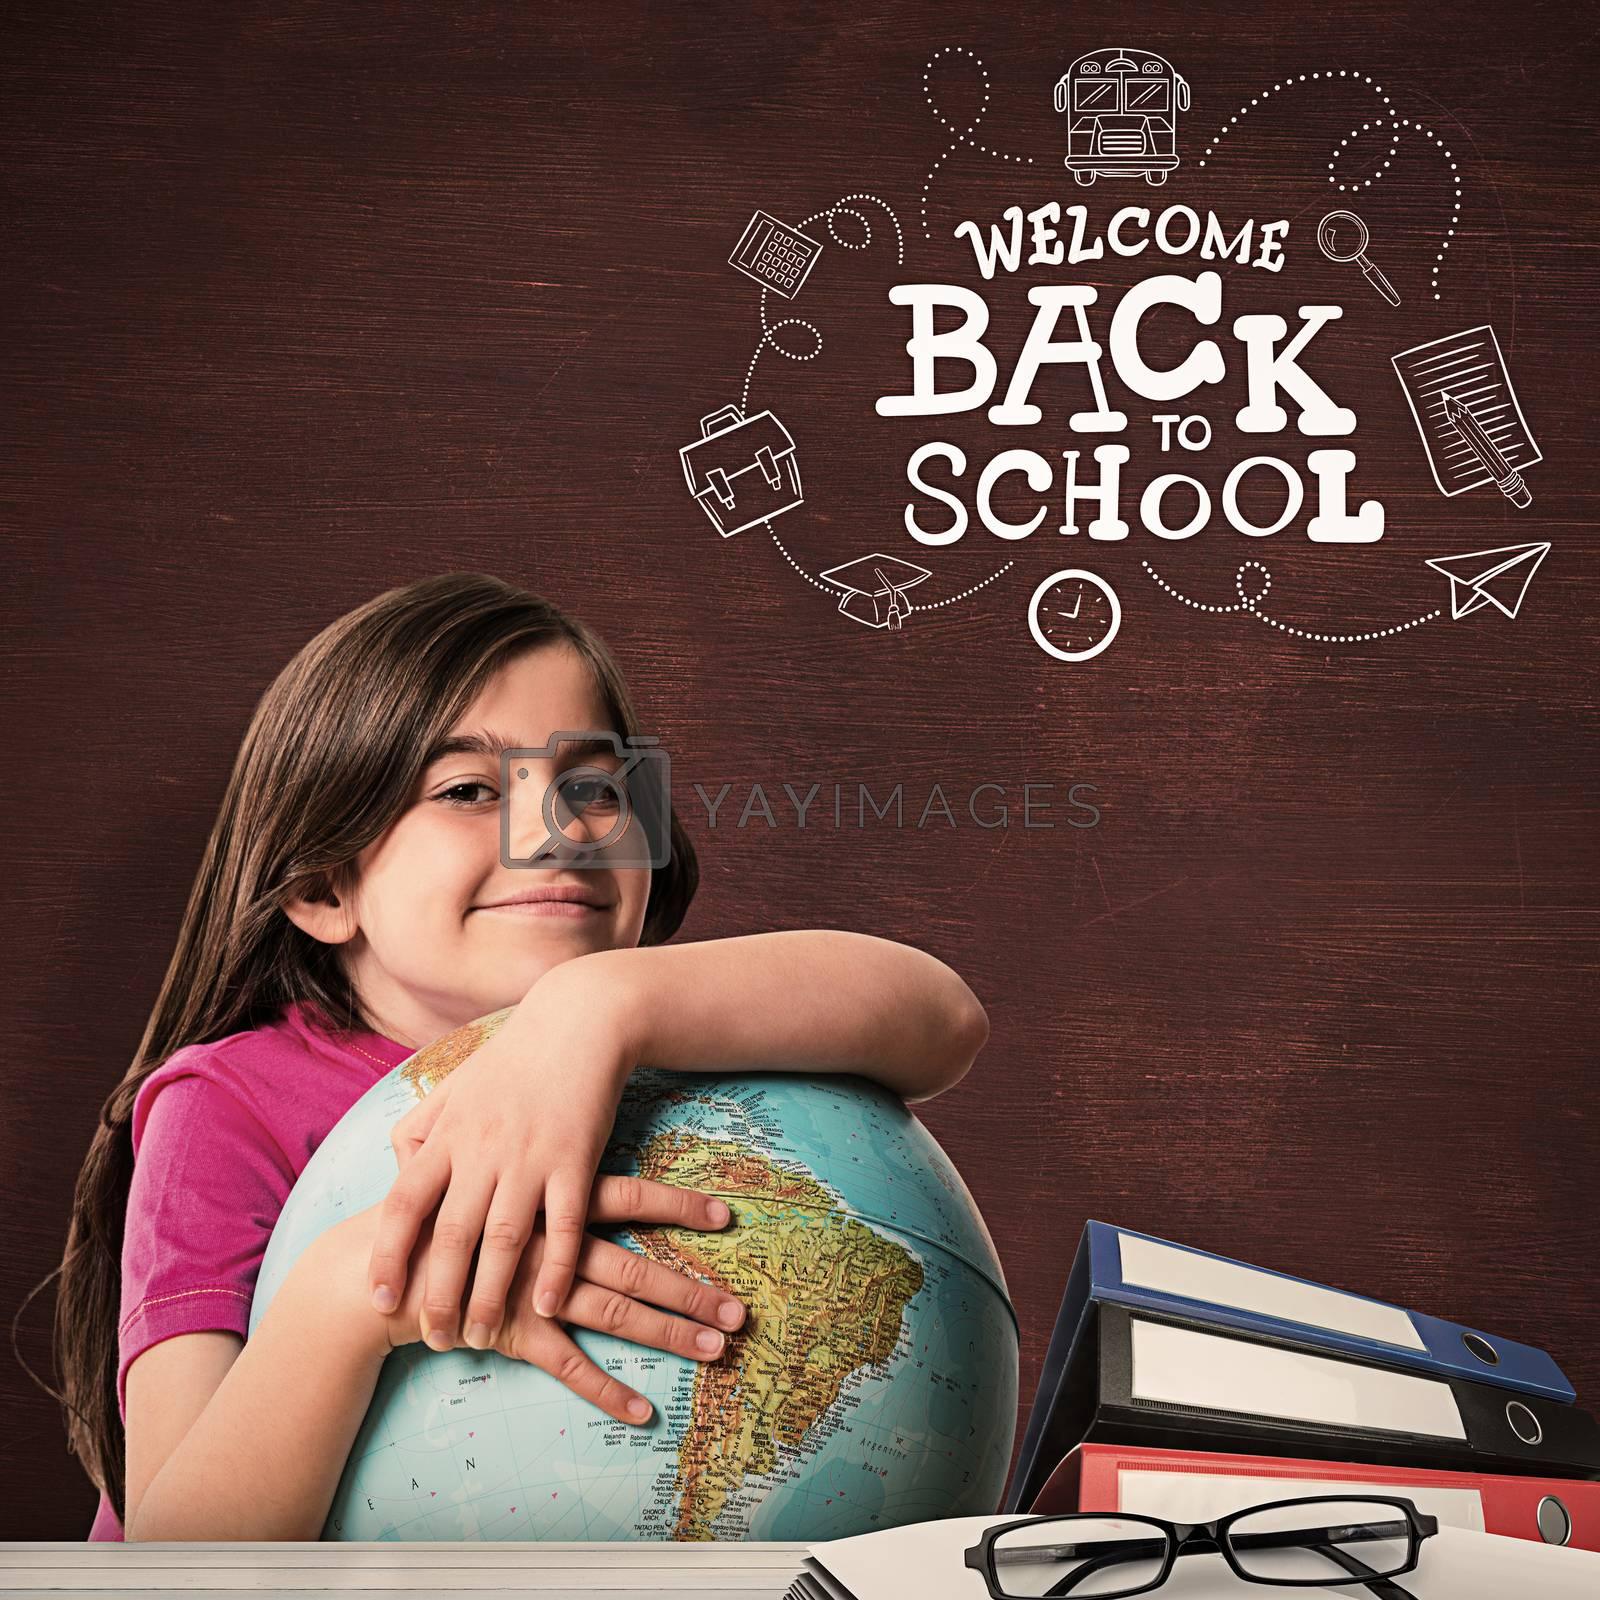 Cute pupil smiling holding globe against desk